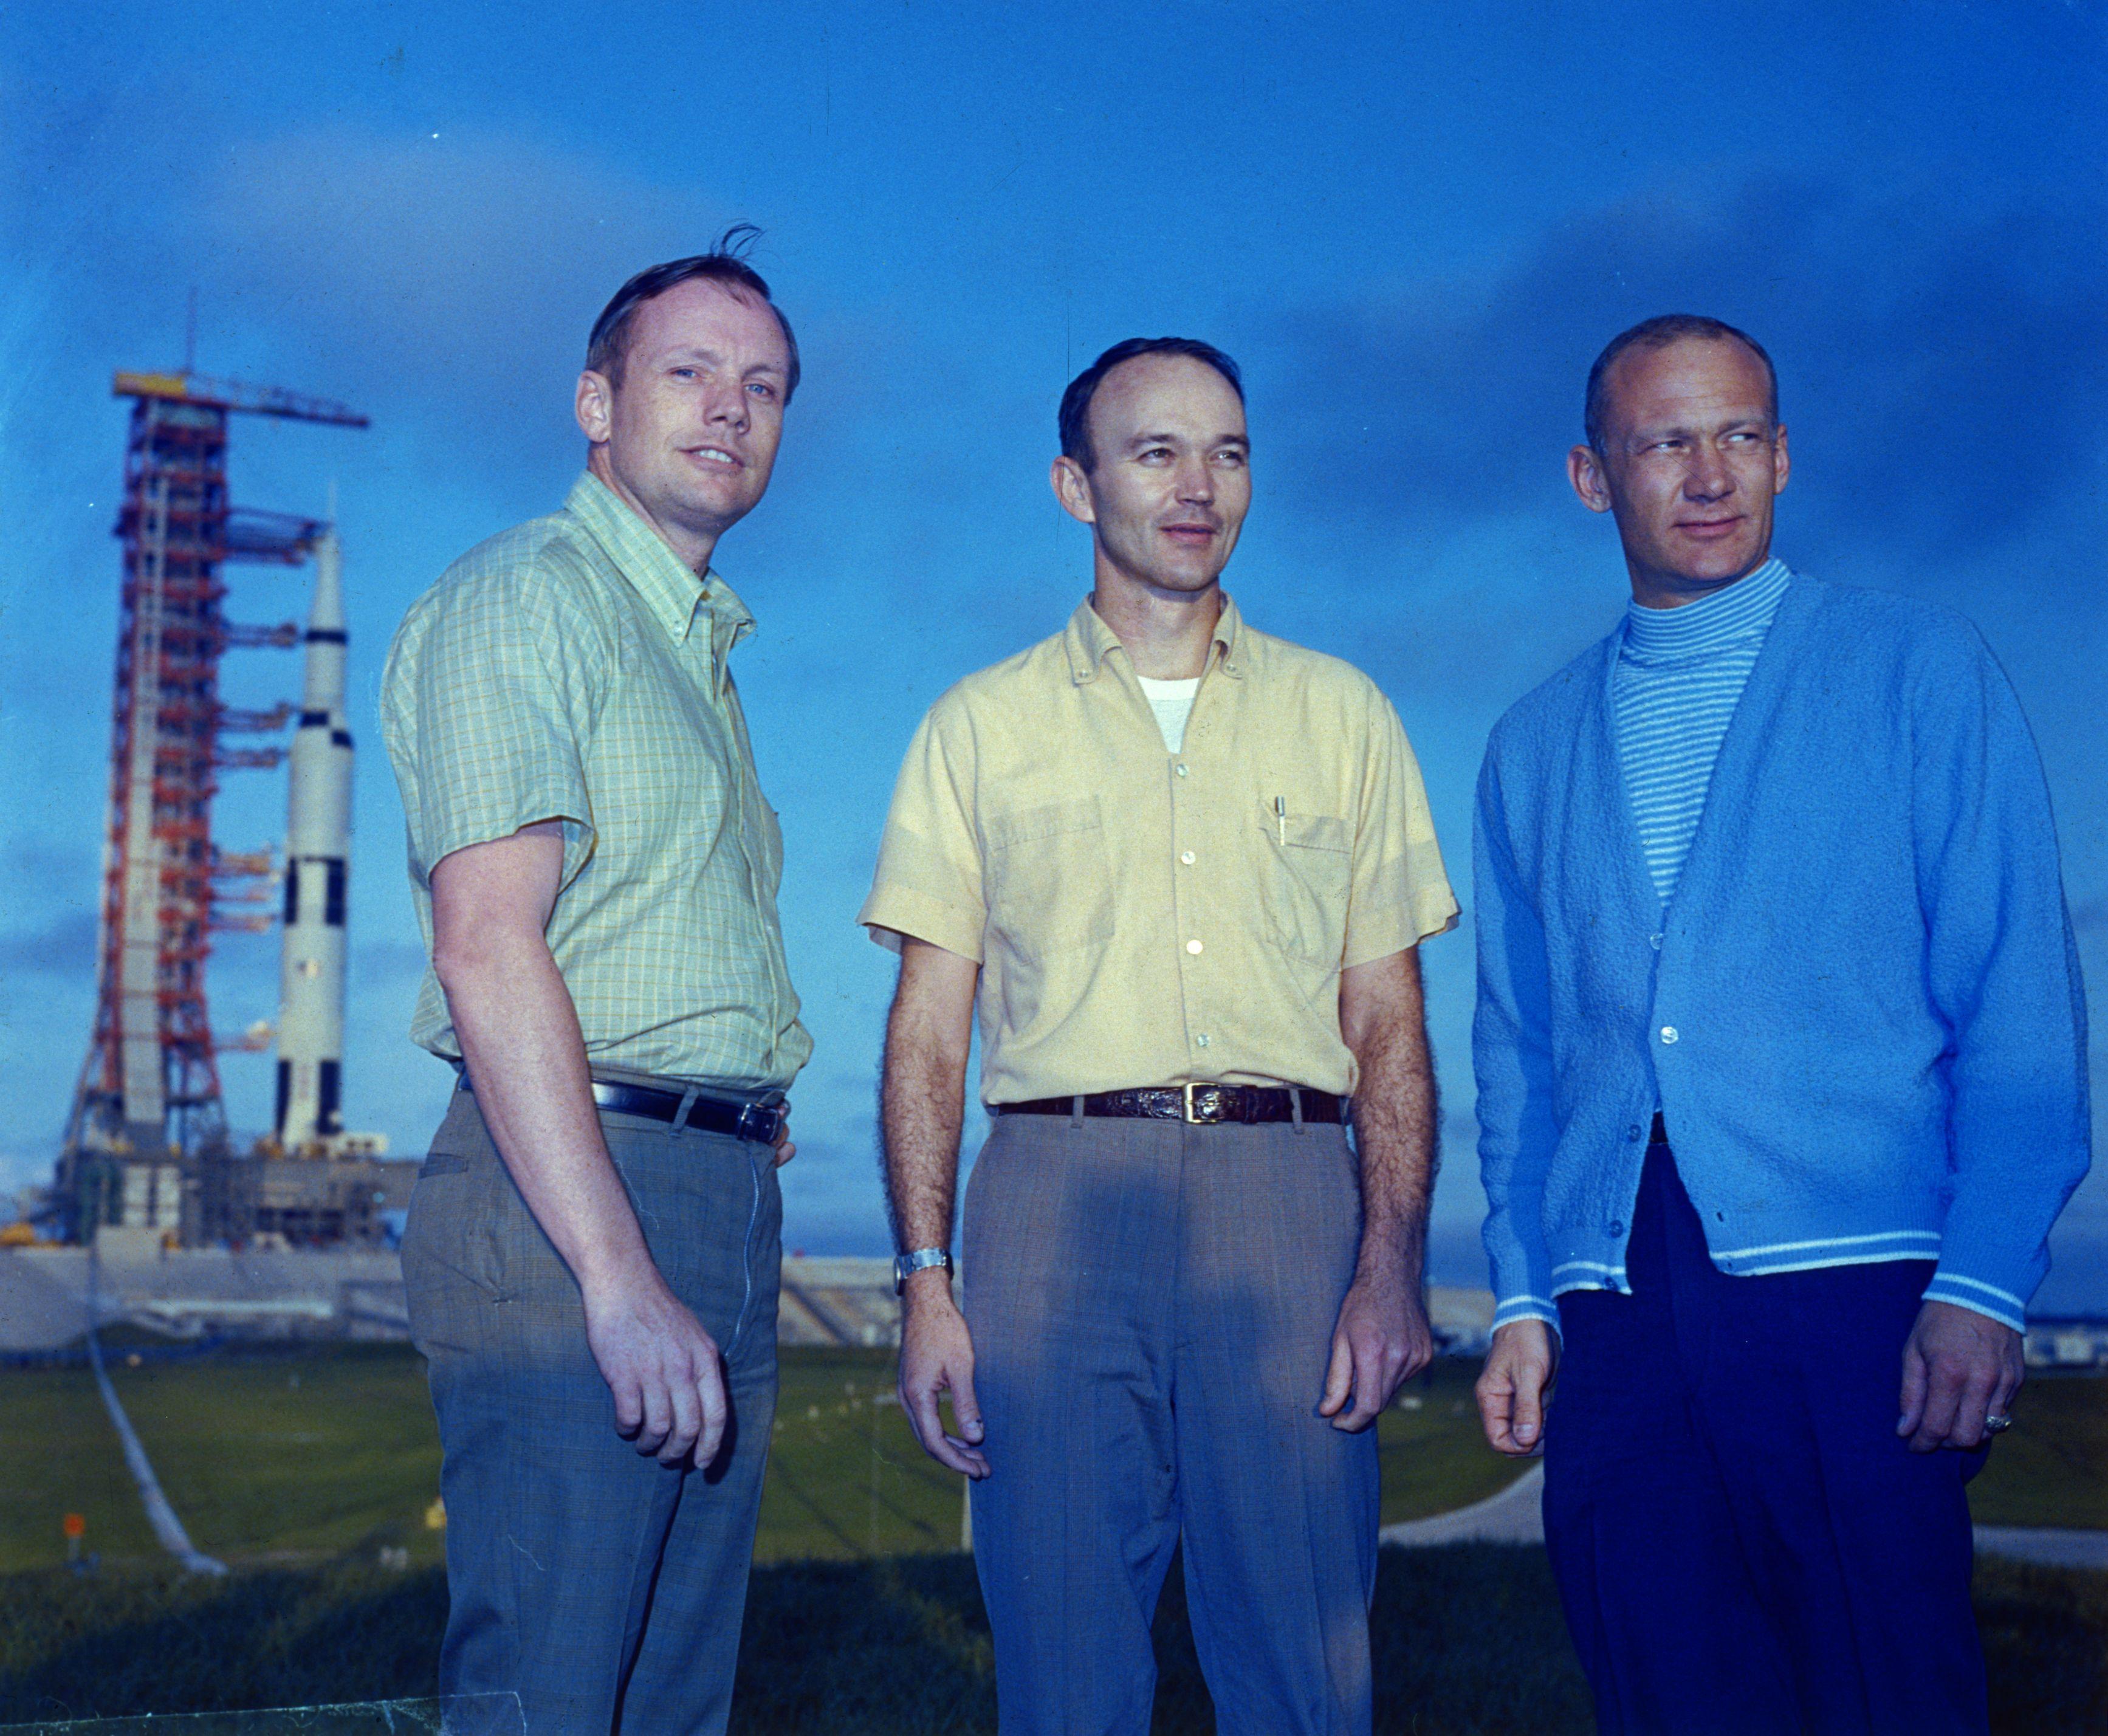 Bagaimana Rasanya Bertetangga dengan Para Astronot?